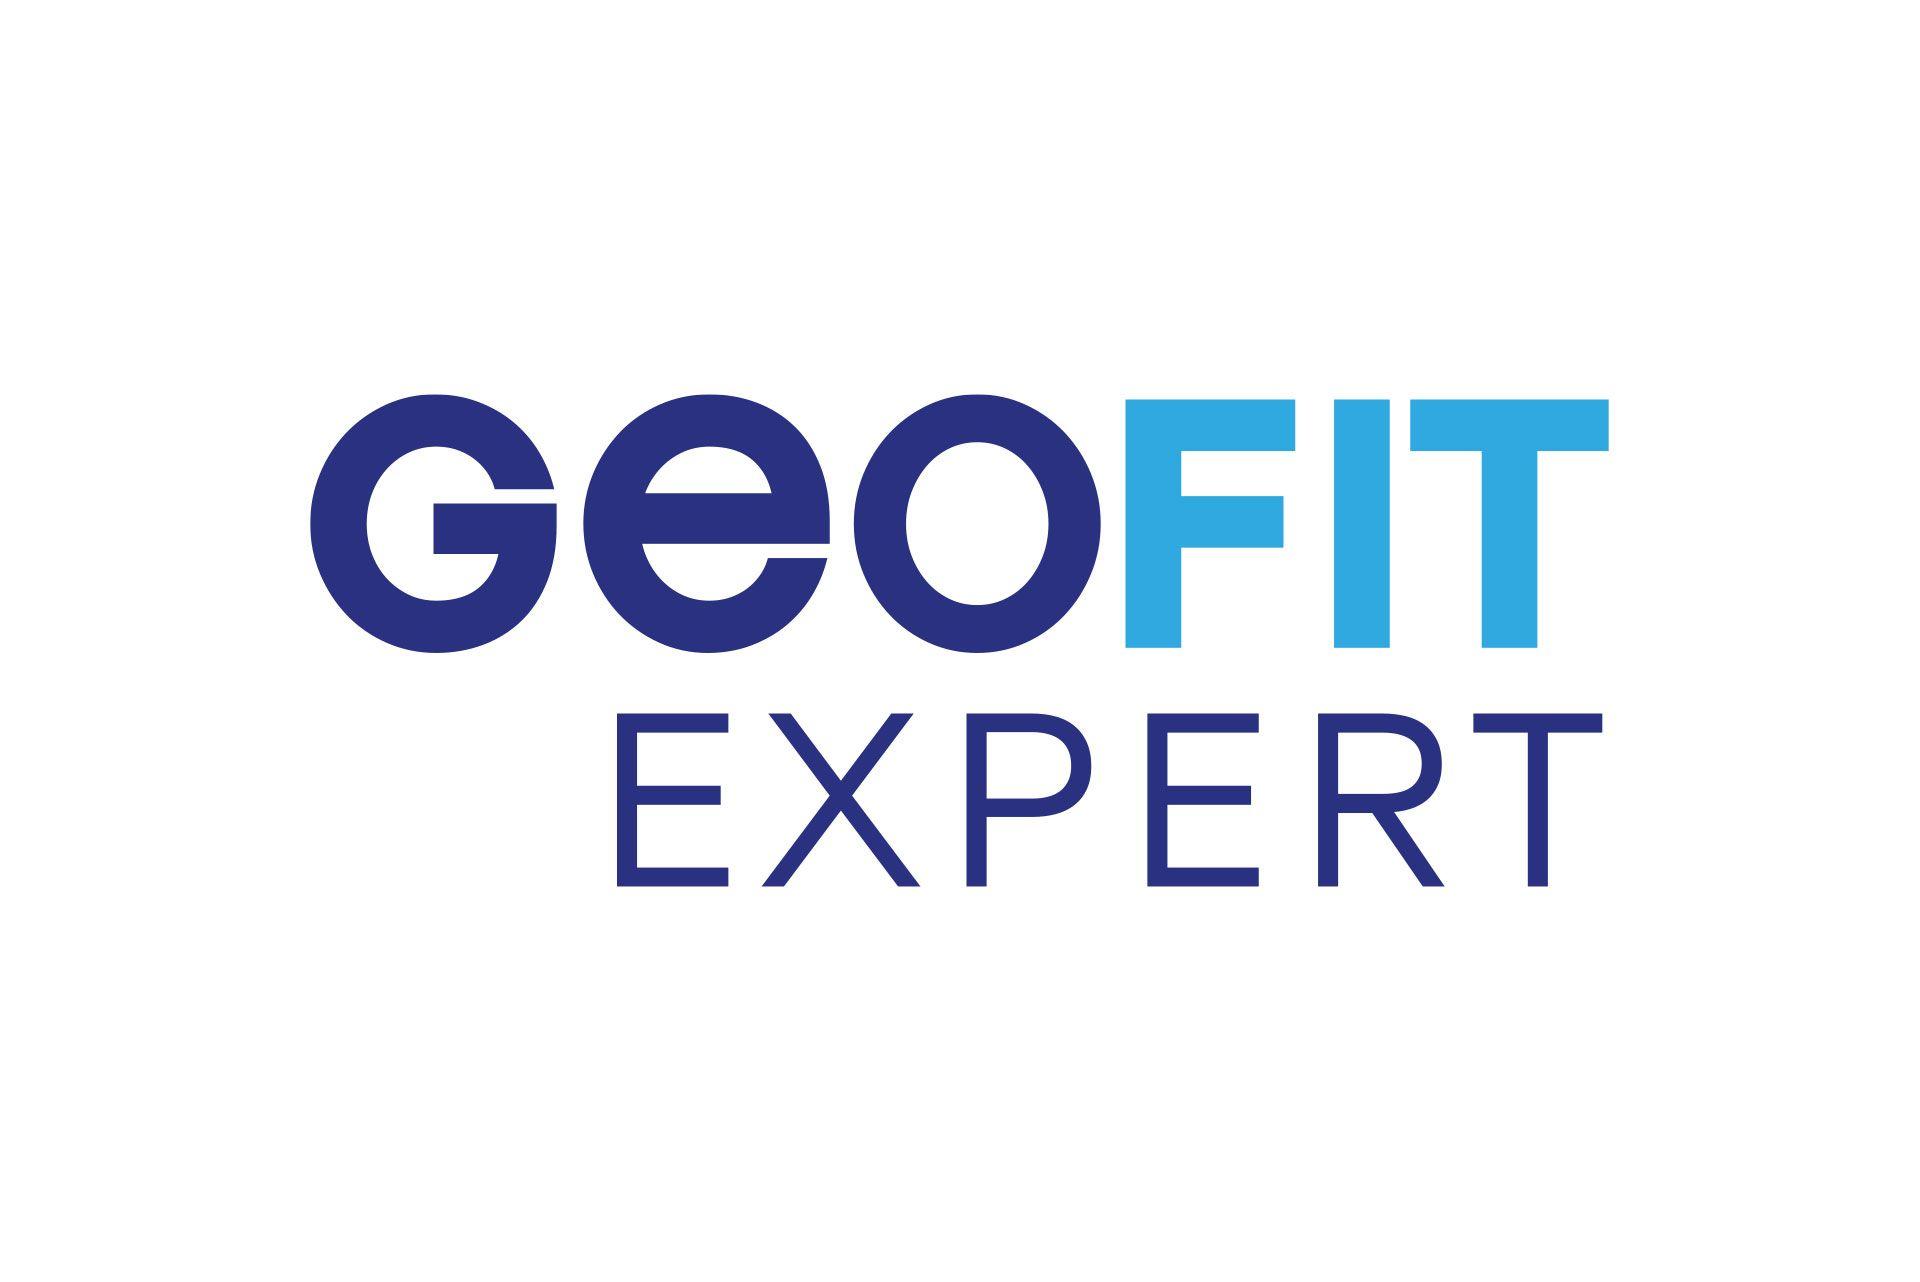 geofit-expert-agence-blc